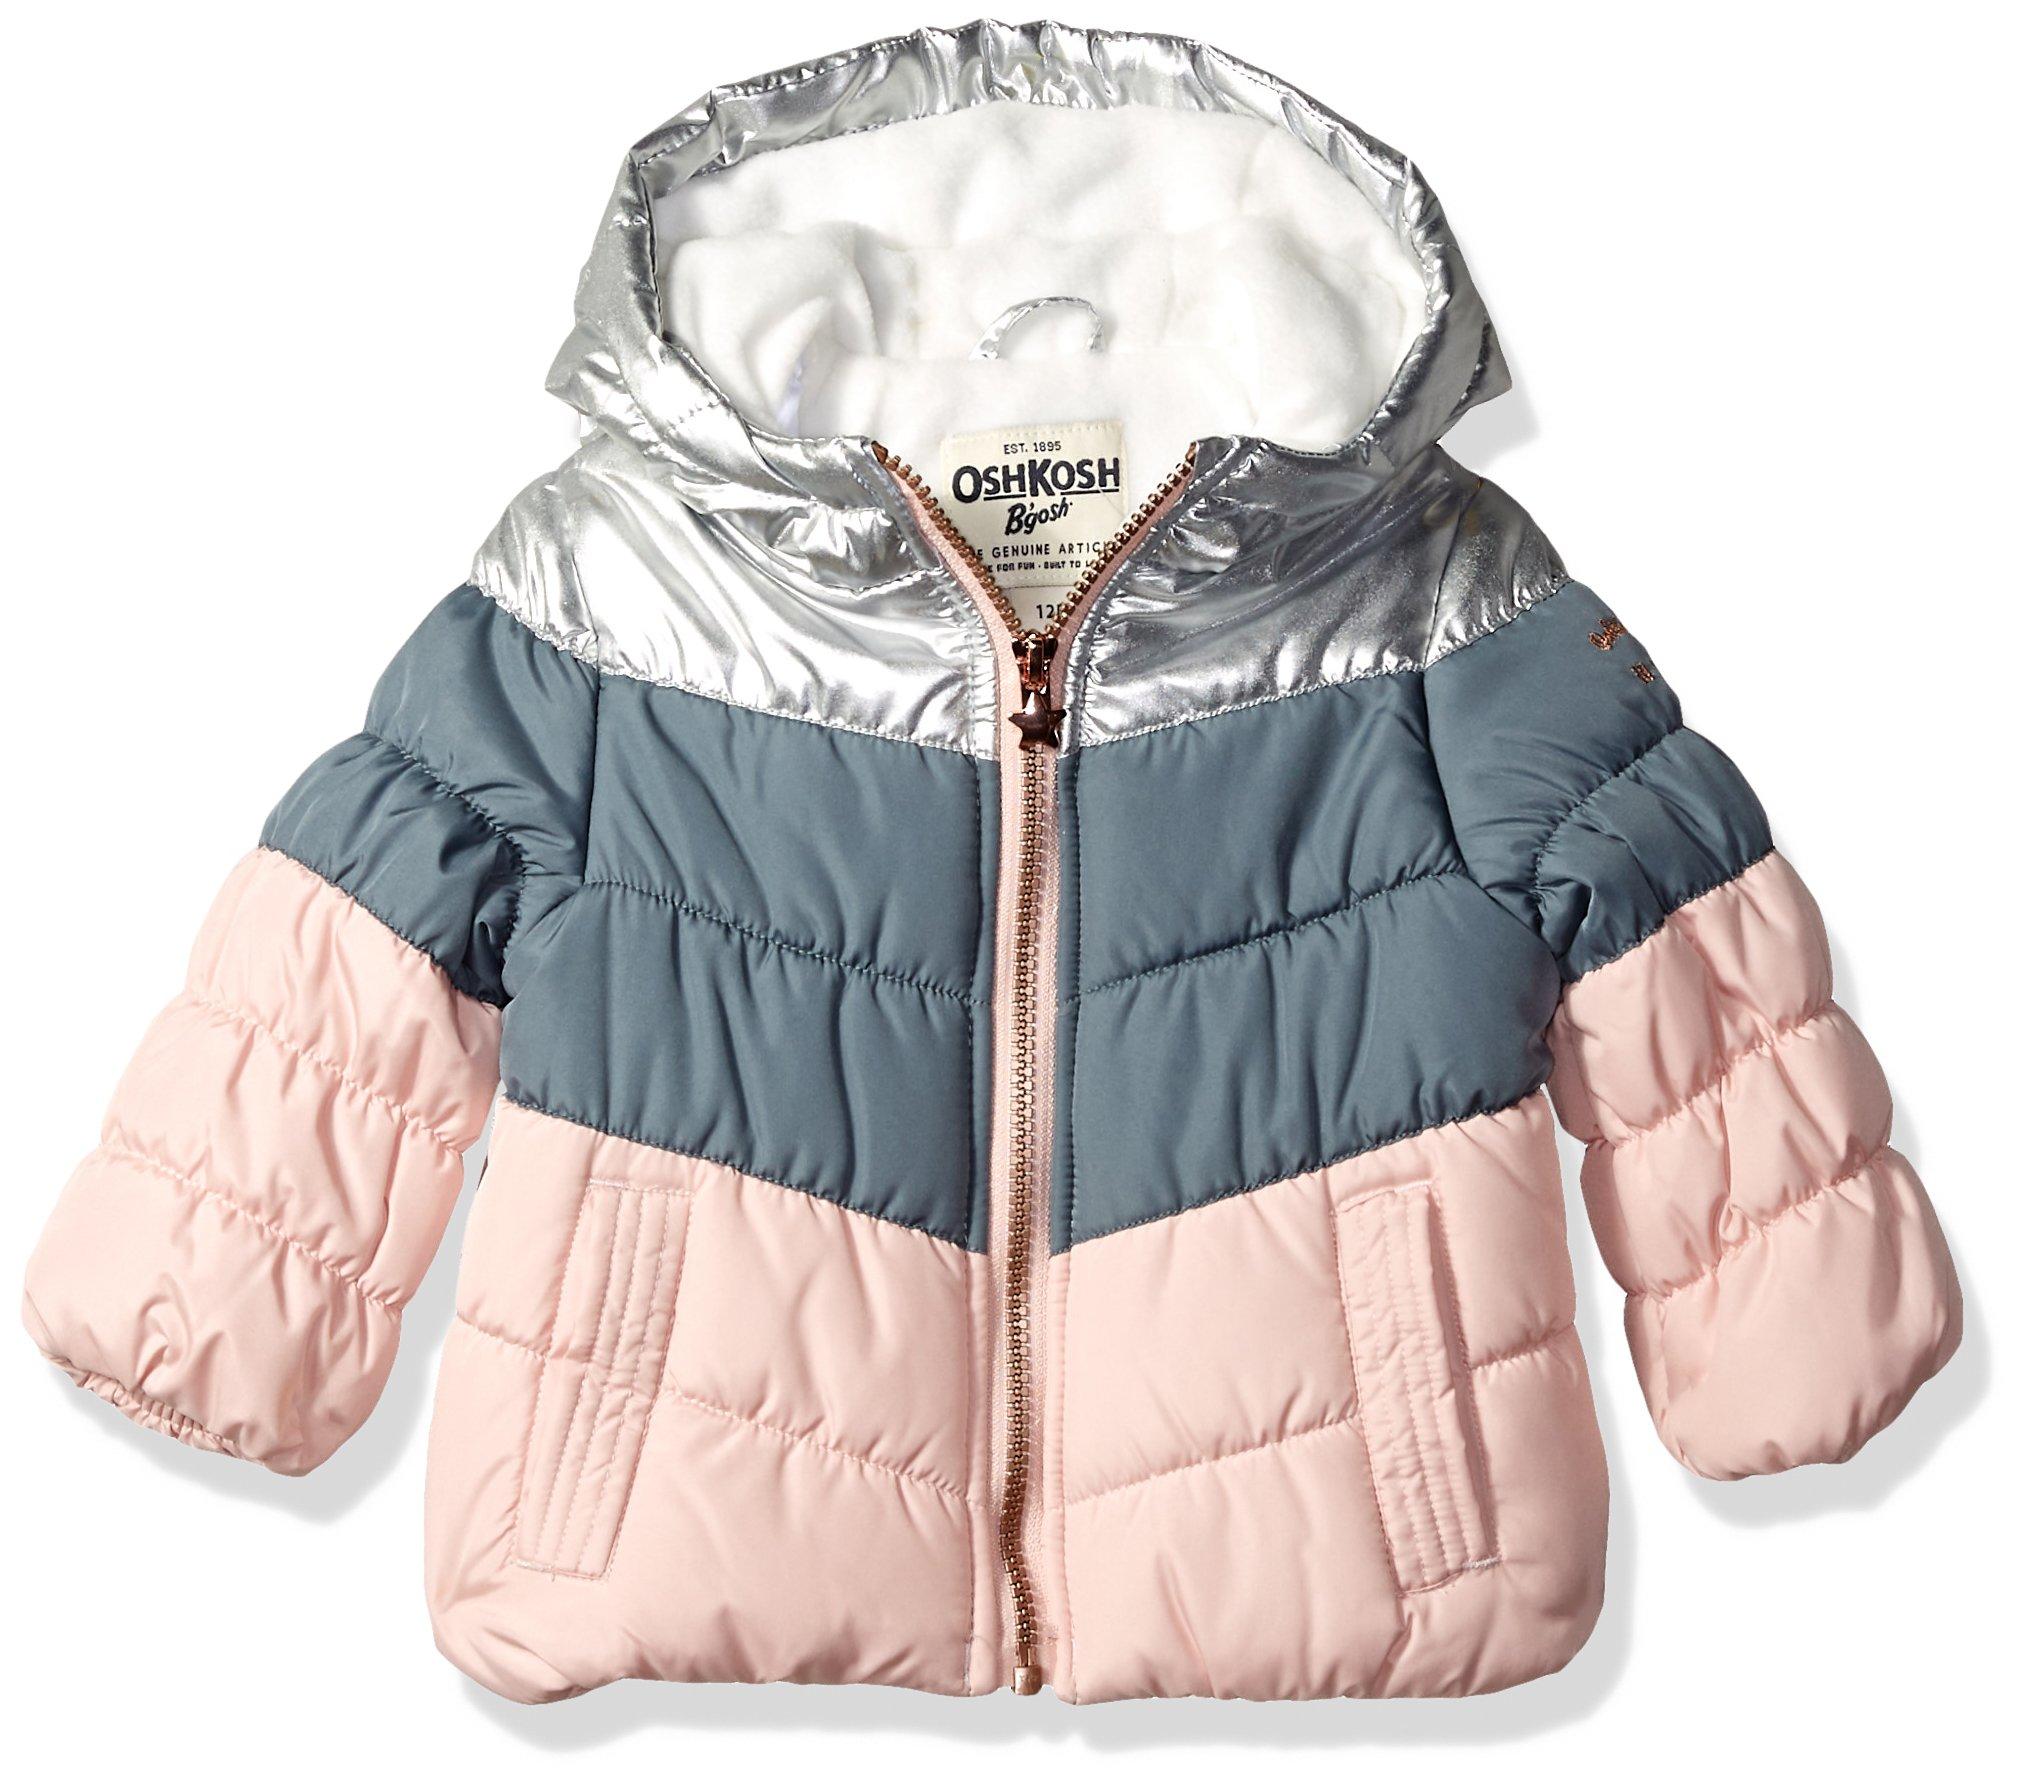 ce5d84e106f34 OshKosh B'Gosh Girls' Perfect Colorblocked Heavyweight Jacket Coat product  image